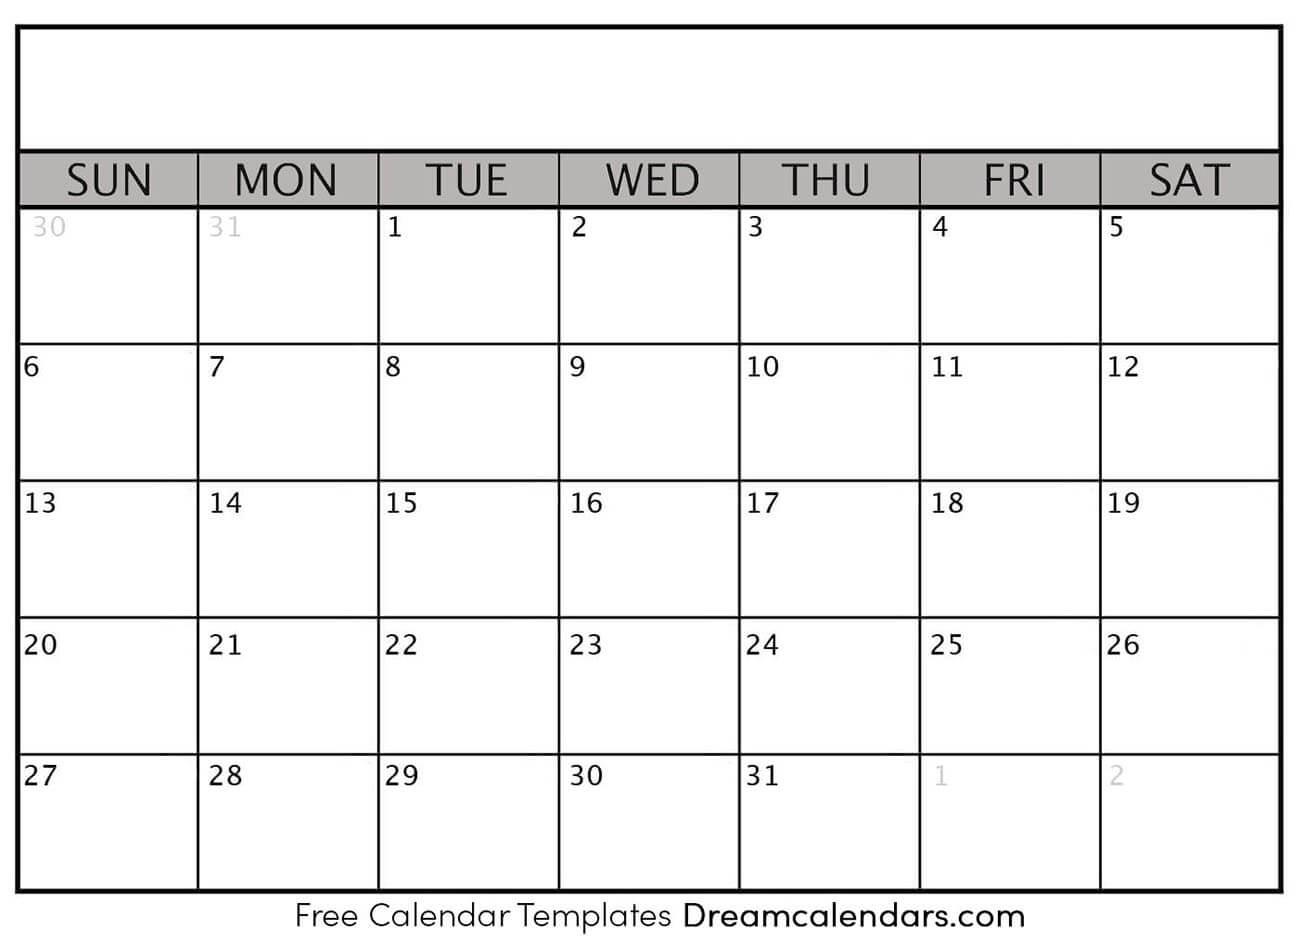 Printable Blank Calendar 2020 | Dream Calendars Exceptional Microsoft Word Printable Calendar 2020